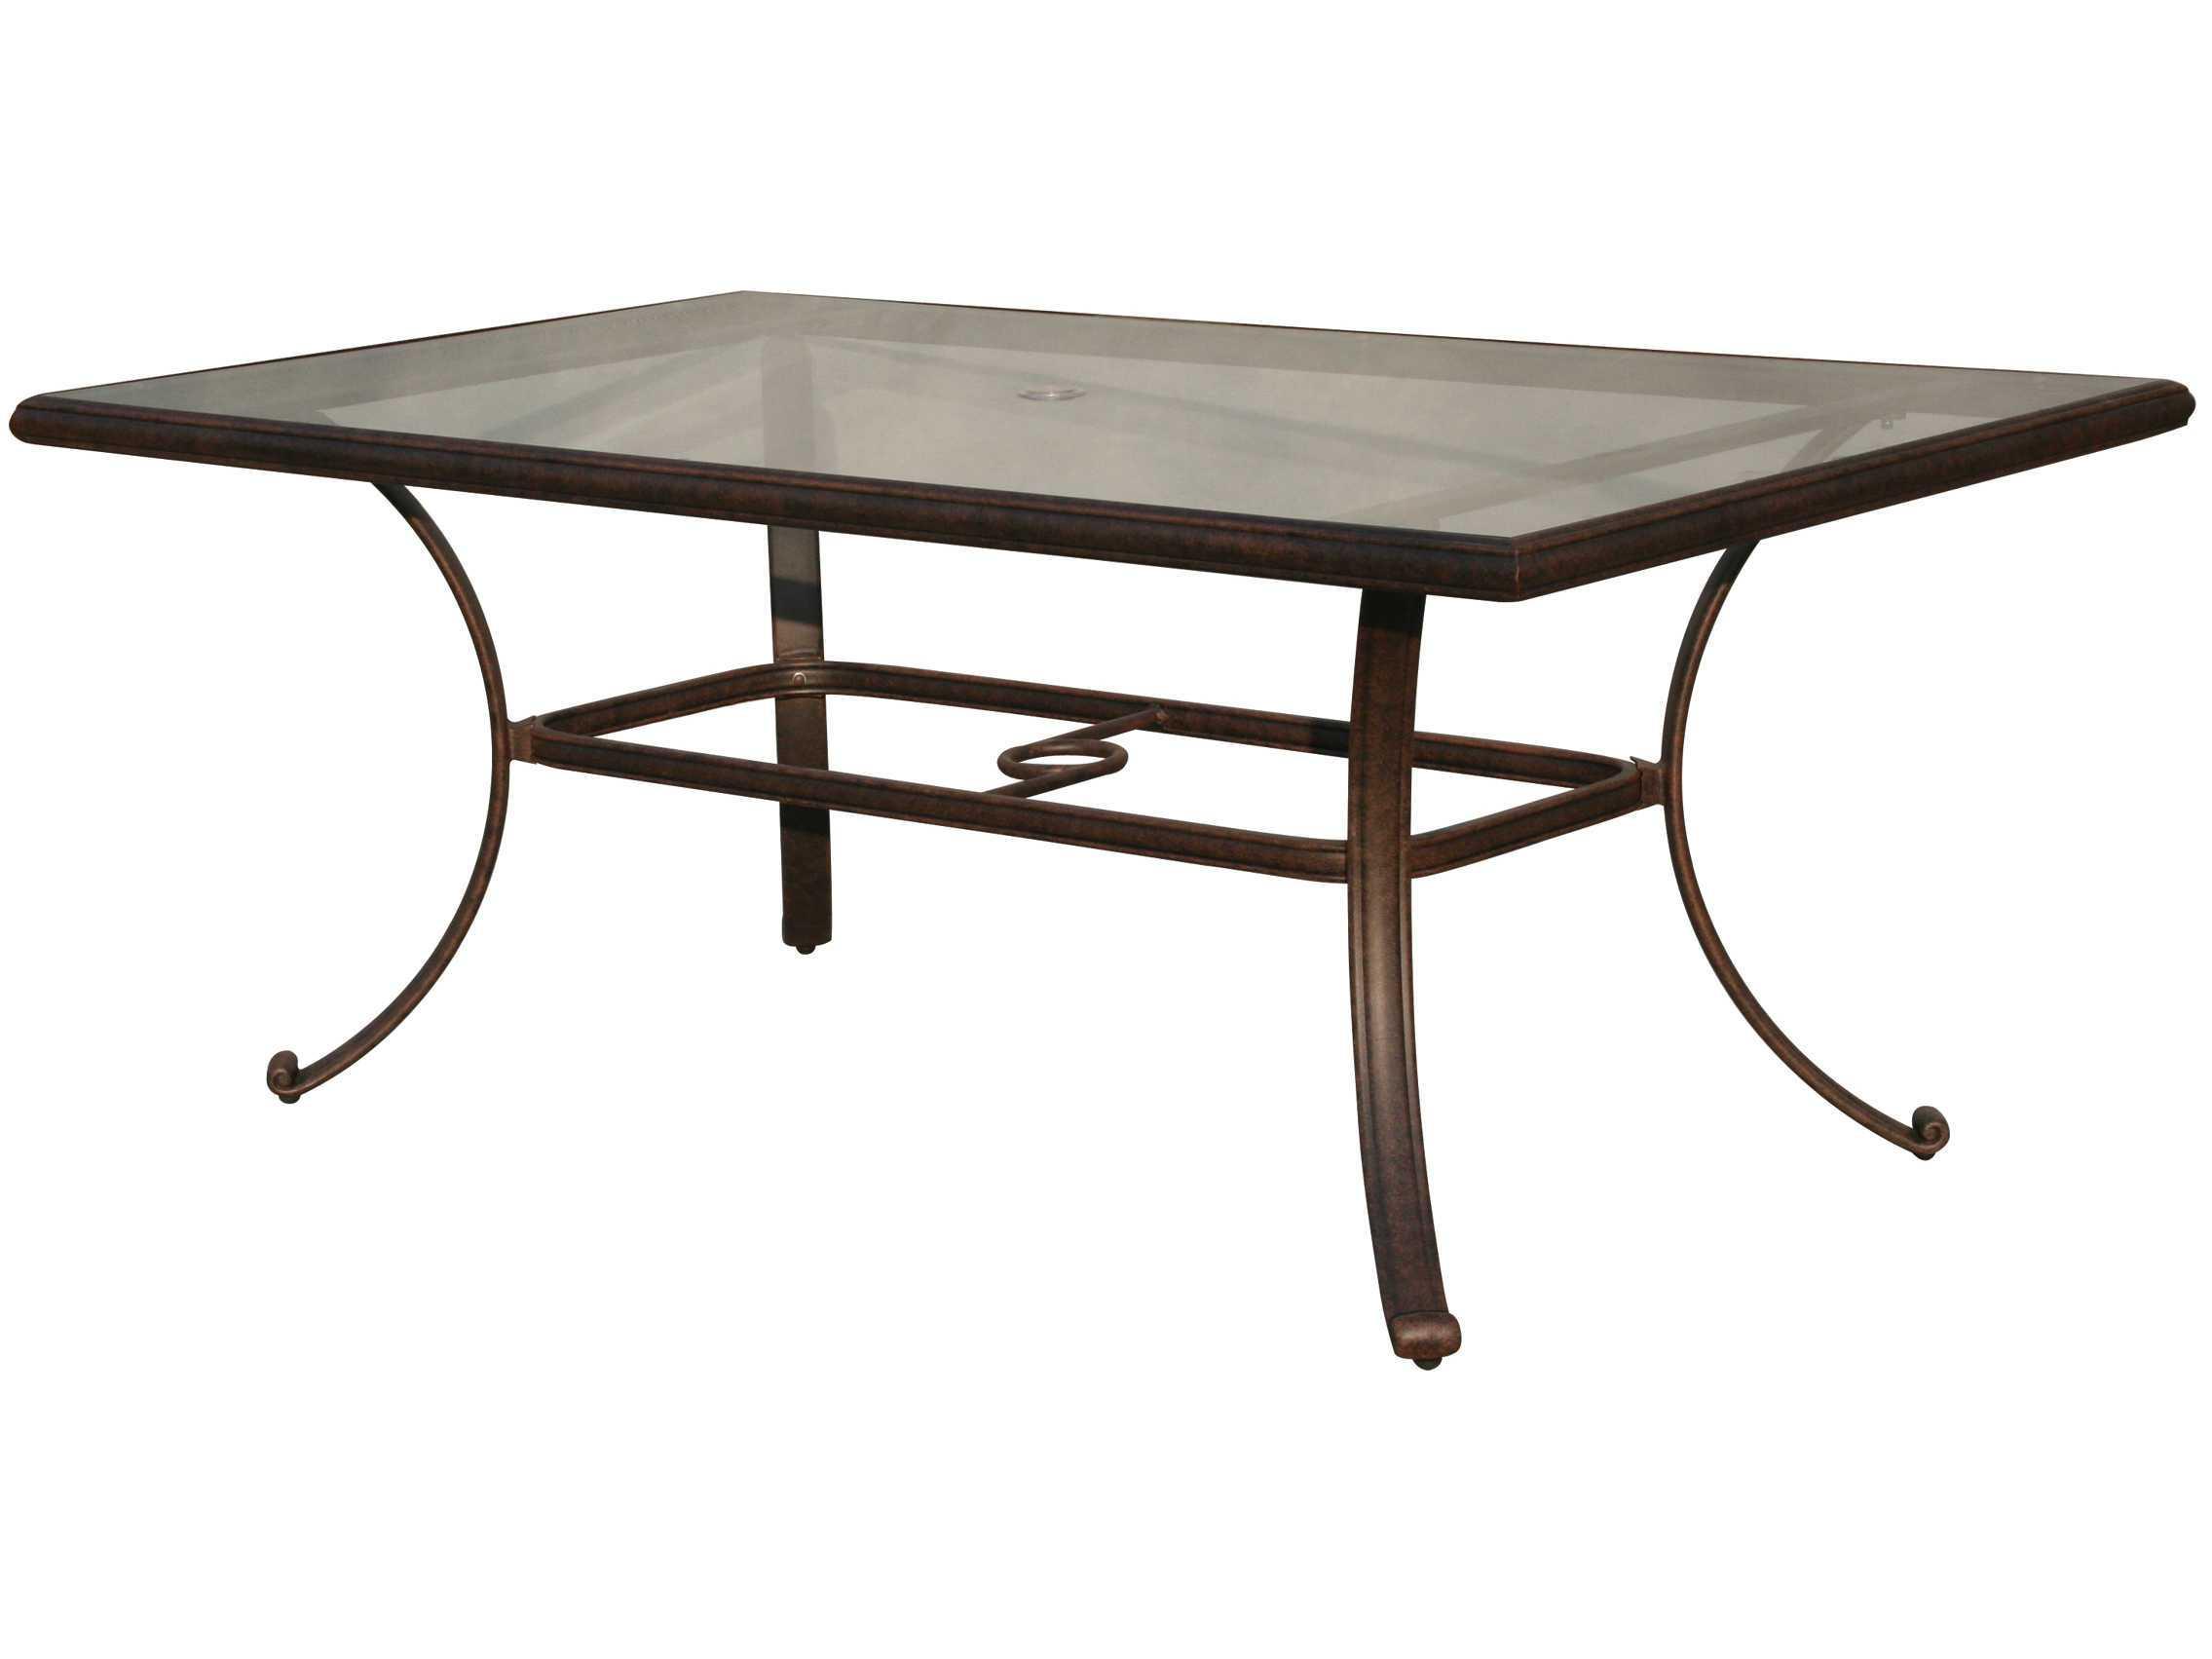 darlee outdoor living glass top cast aluminum antique bronze 72 x 42 rectangular dining table